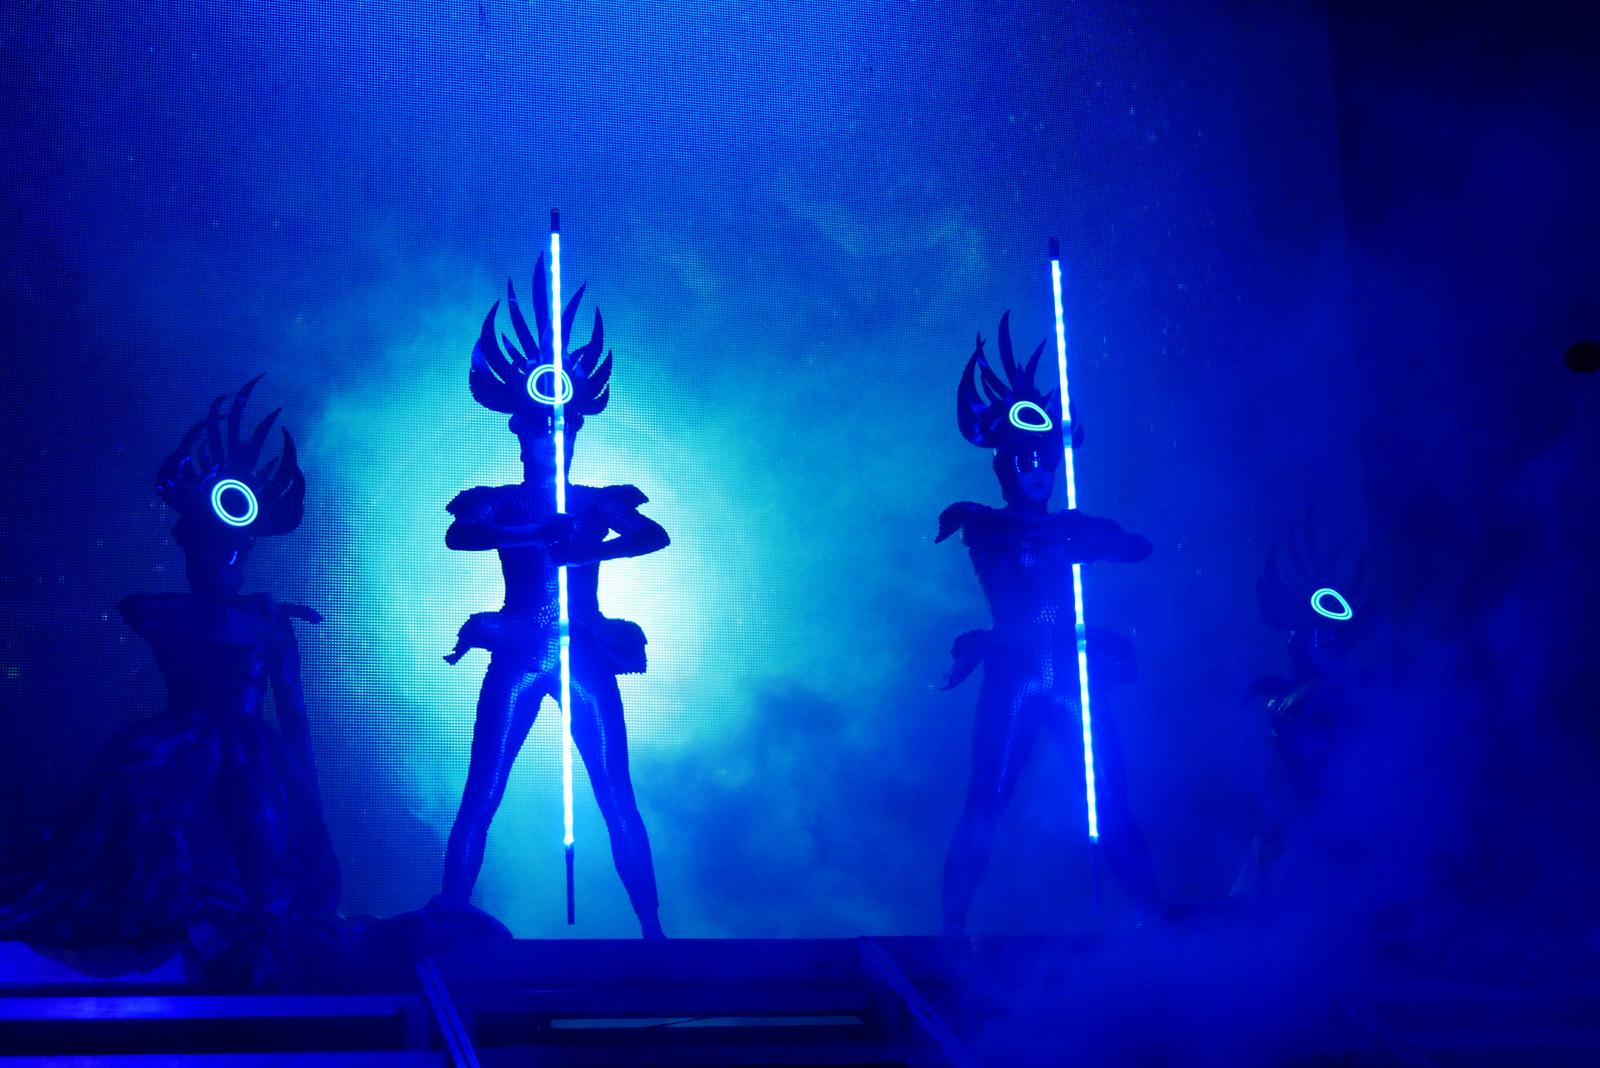 empire-of-the-sun-dancers-concert-paris-olympia-two-vines-tour-new-album-live-stage-photo-usofparis-blog